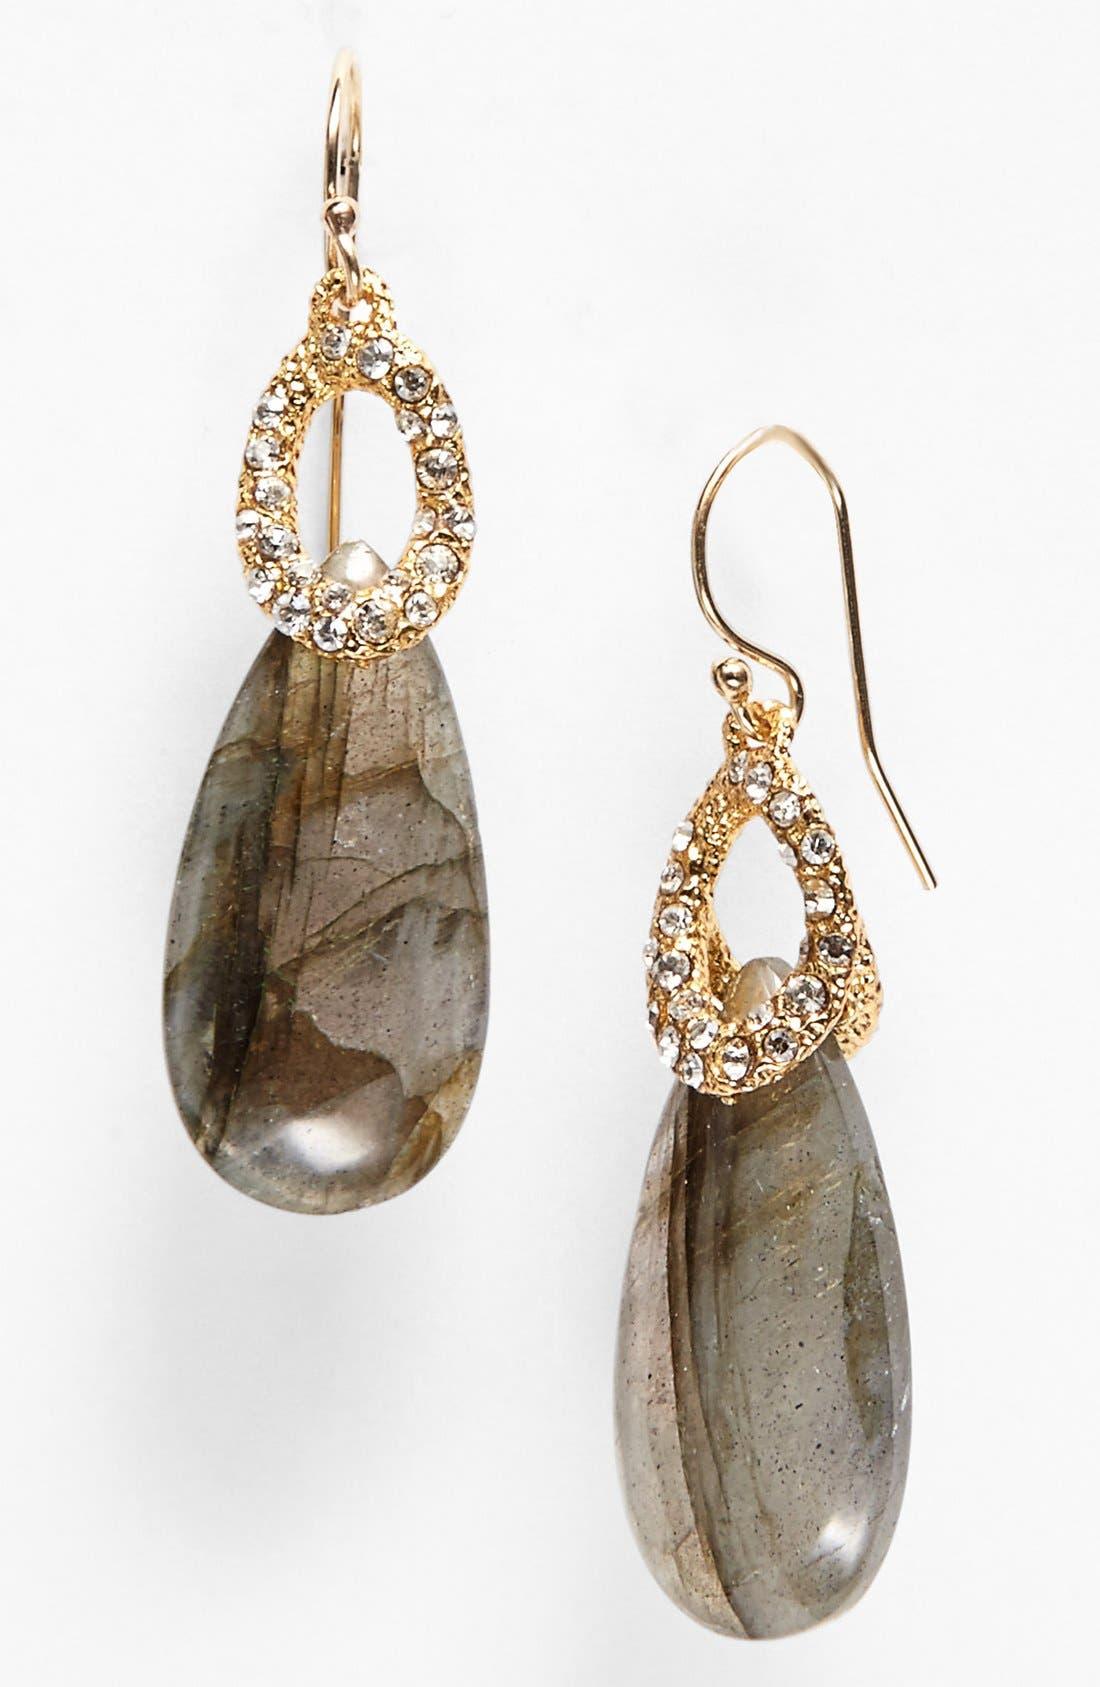 Alternate Image 1 Selected - Alexis Bittar 'Elements' Stone Teardrop Earrings